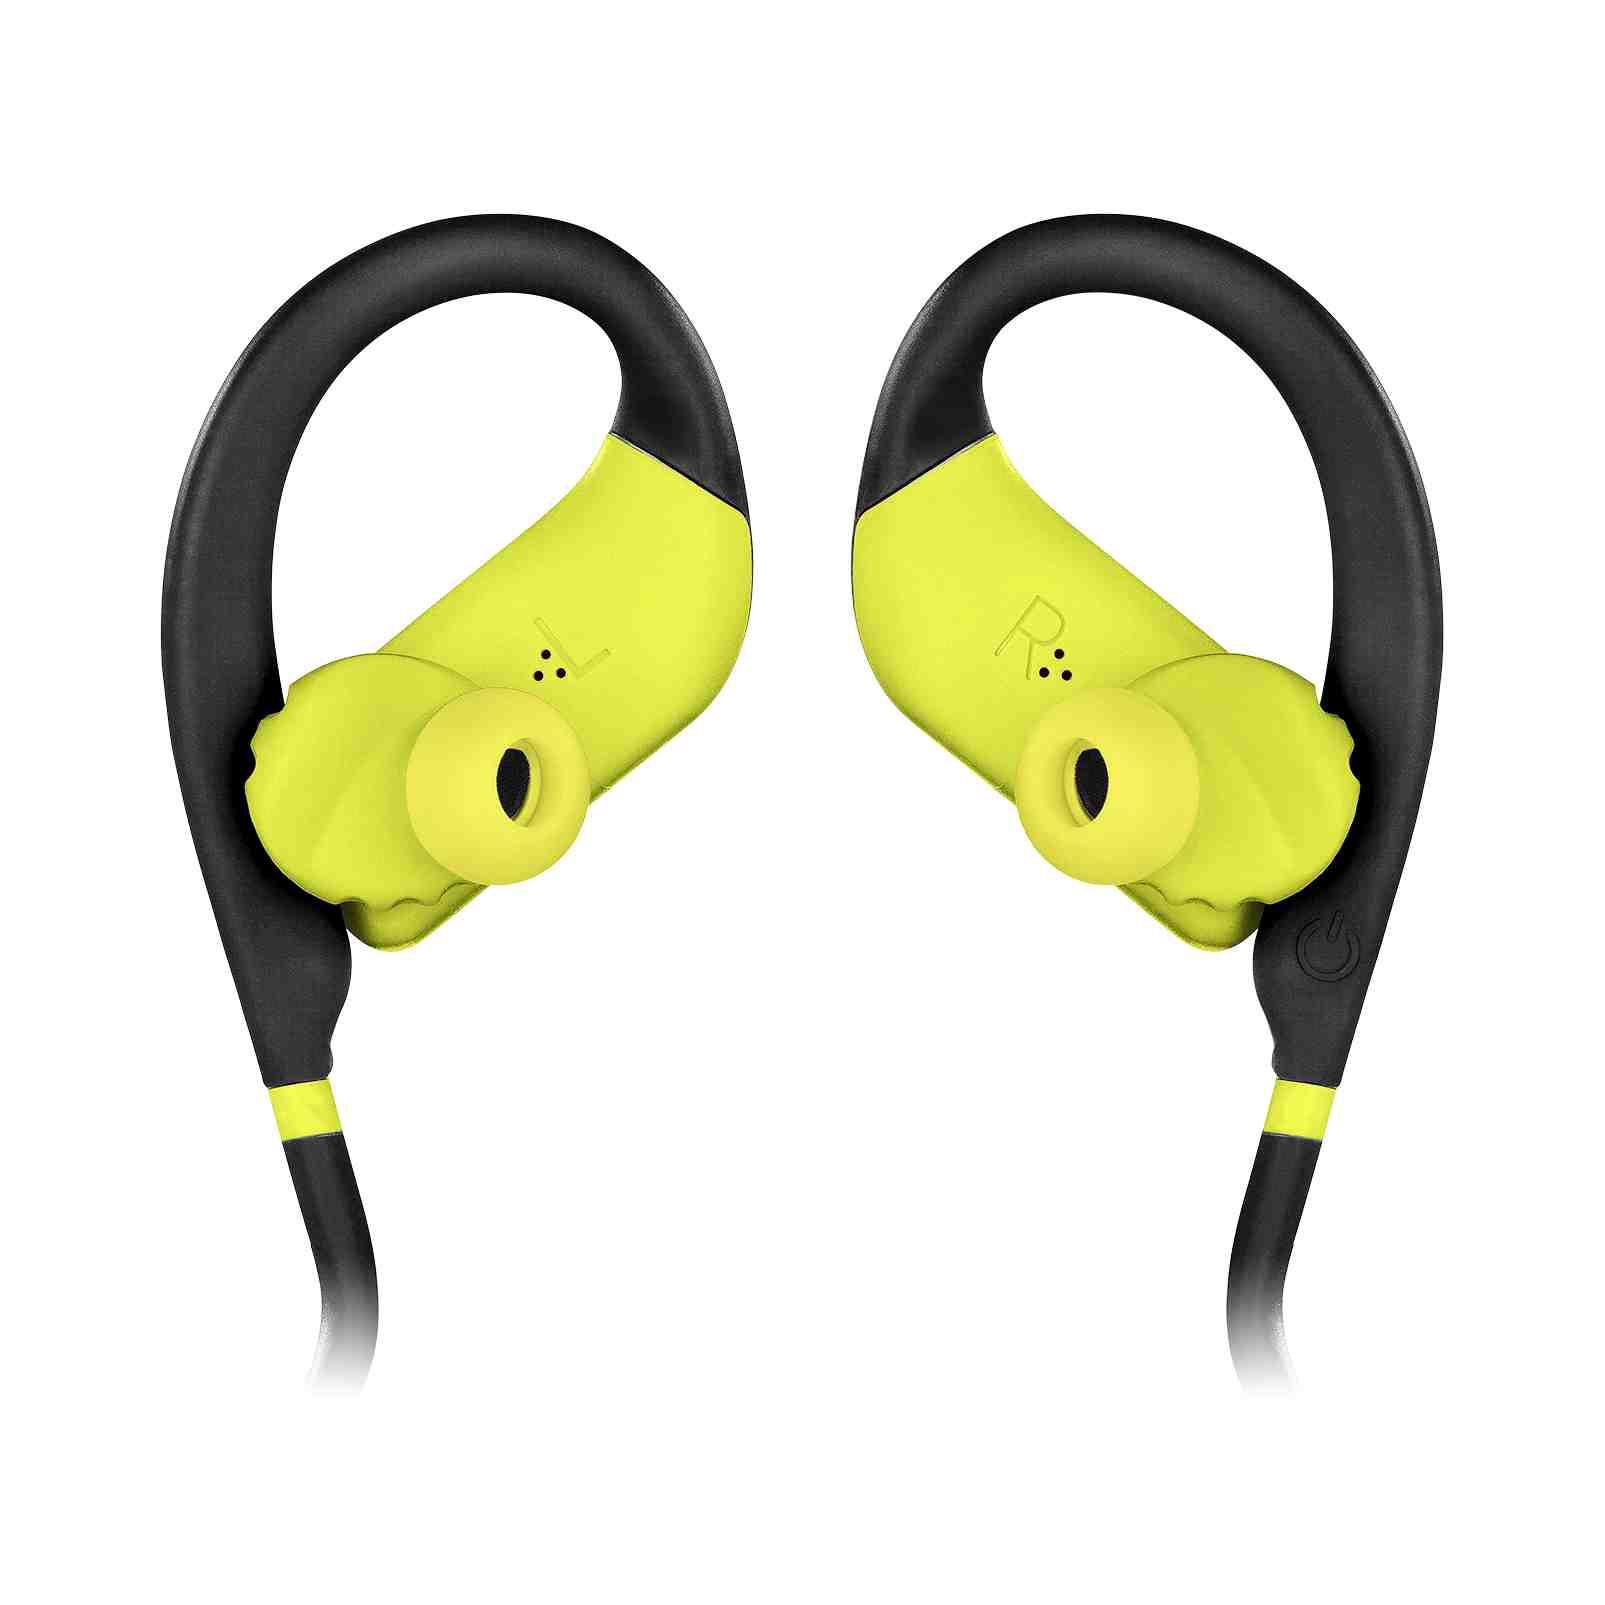 Fone de Ouvido Bluetooth JBL Endurance Jump - Preto e Amarelo JBLENDURJUMPBNL